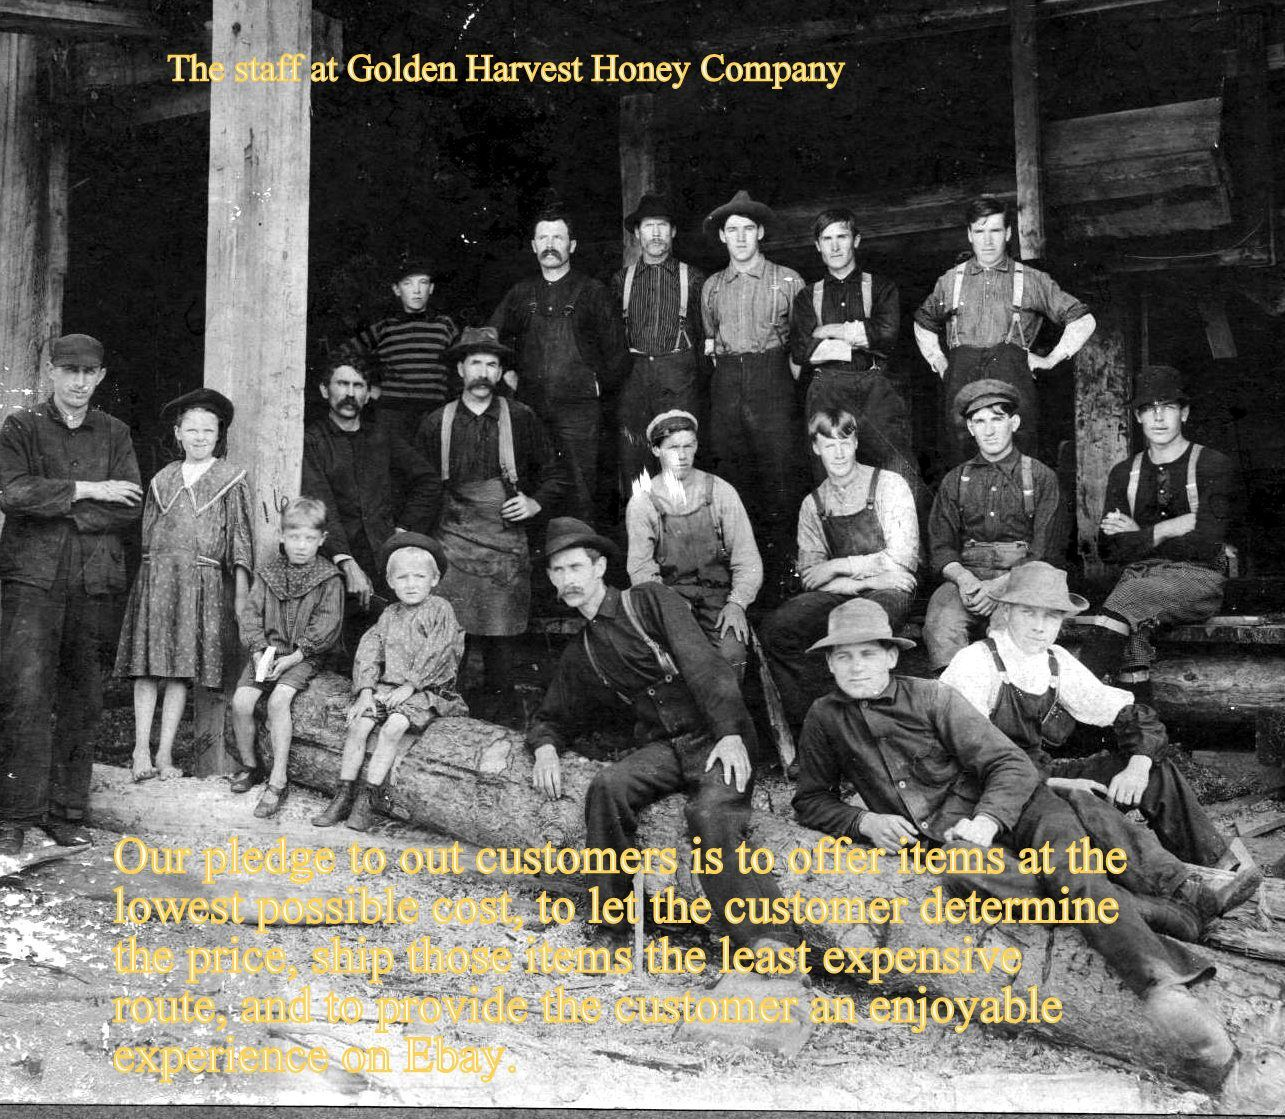 Golden Harvest Honey Company